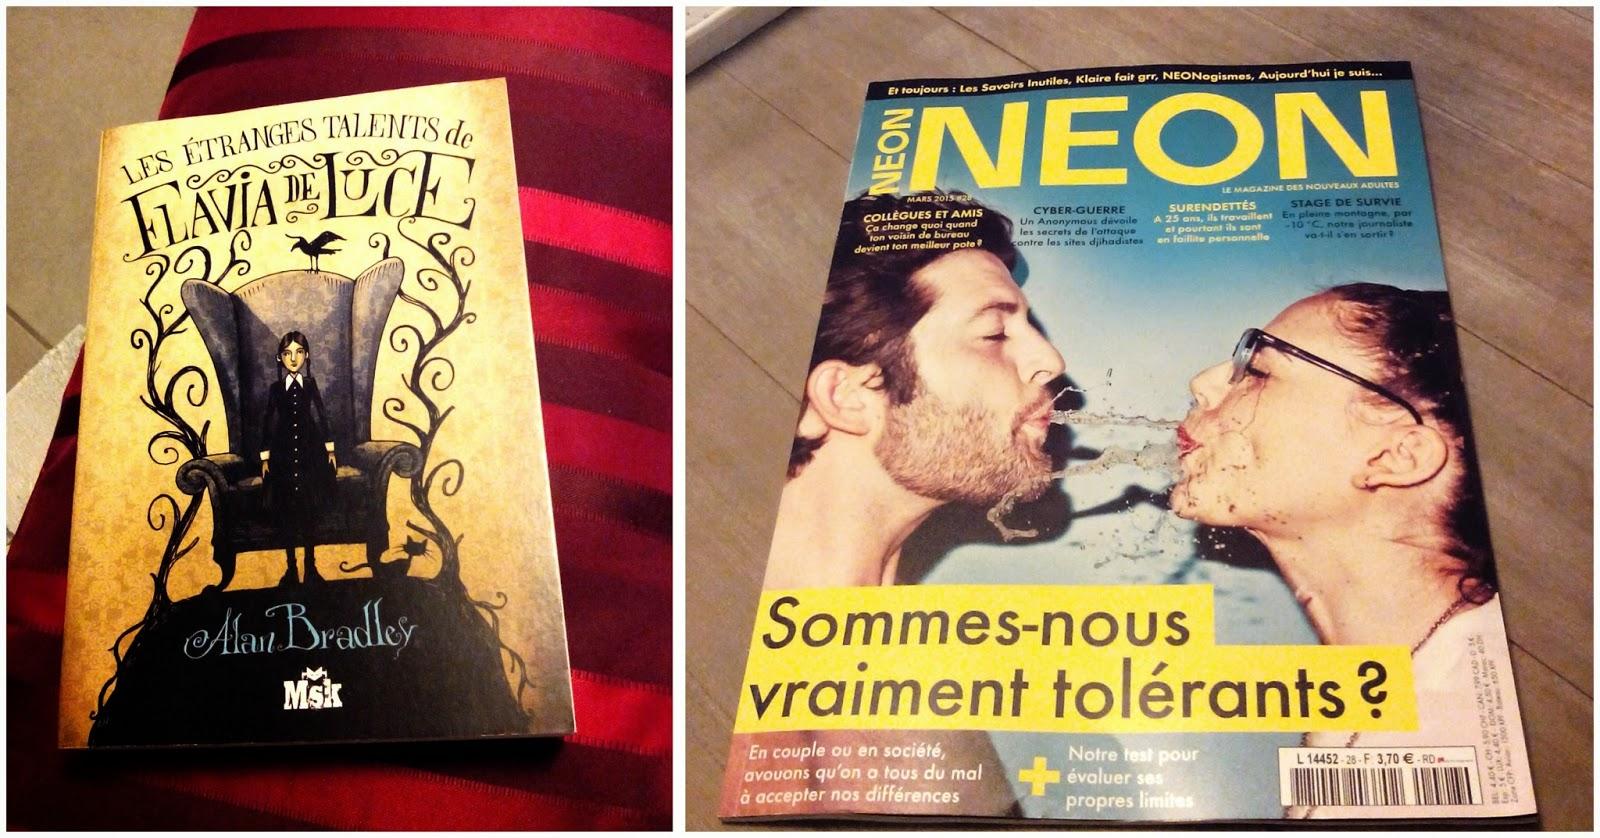 roman, flavia de luce, magazine, neon, bullelodie